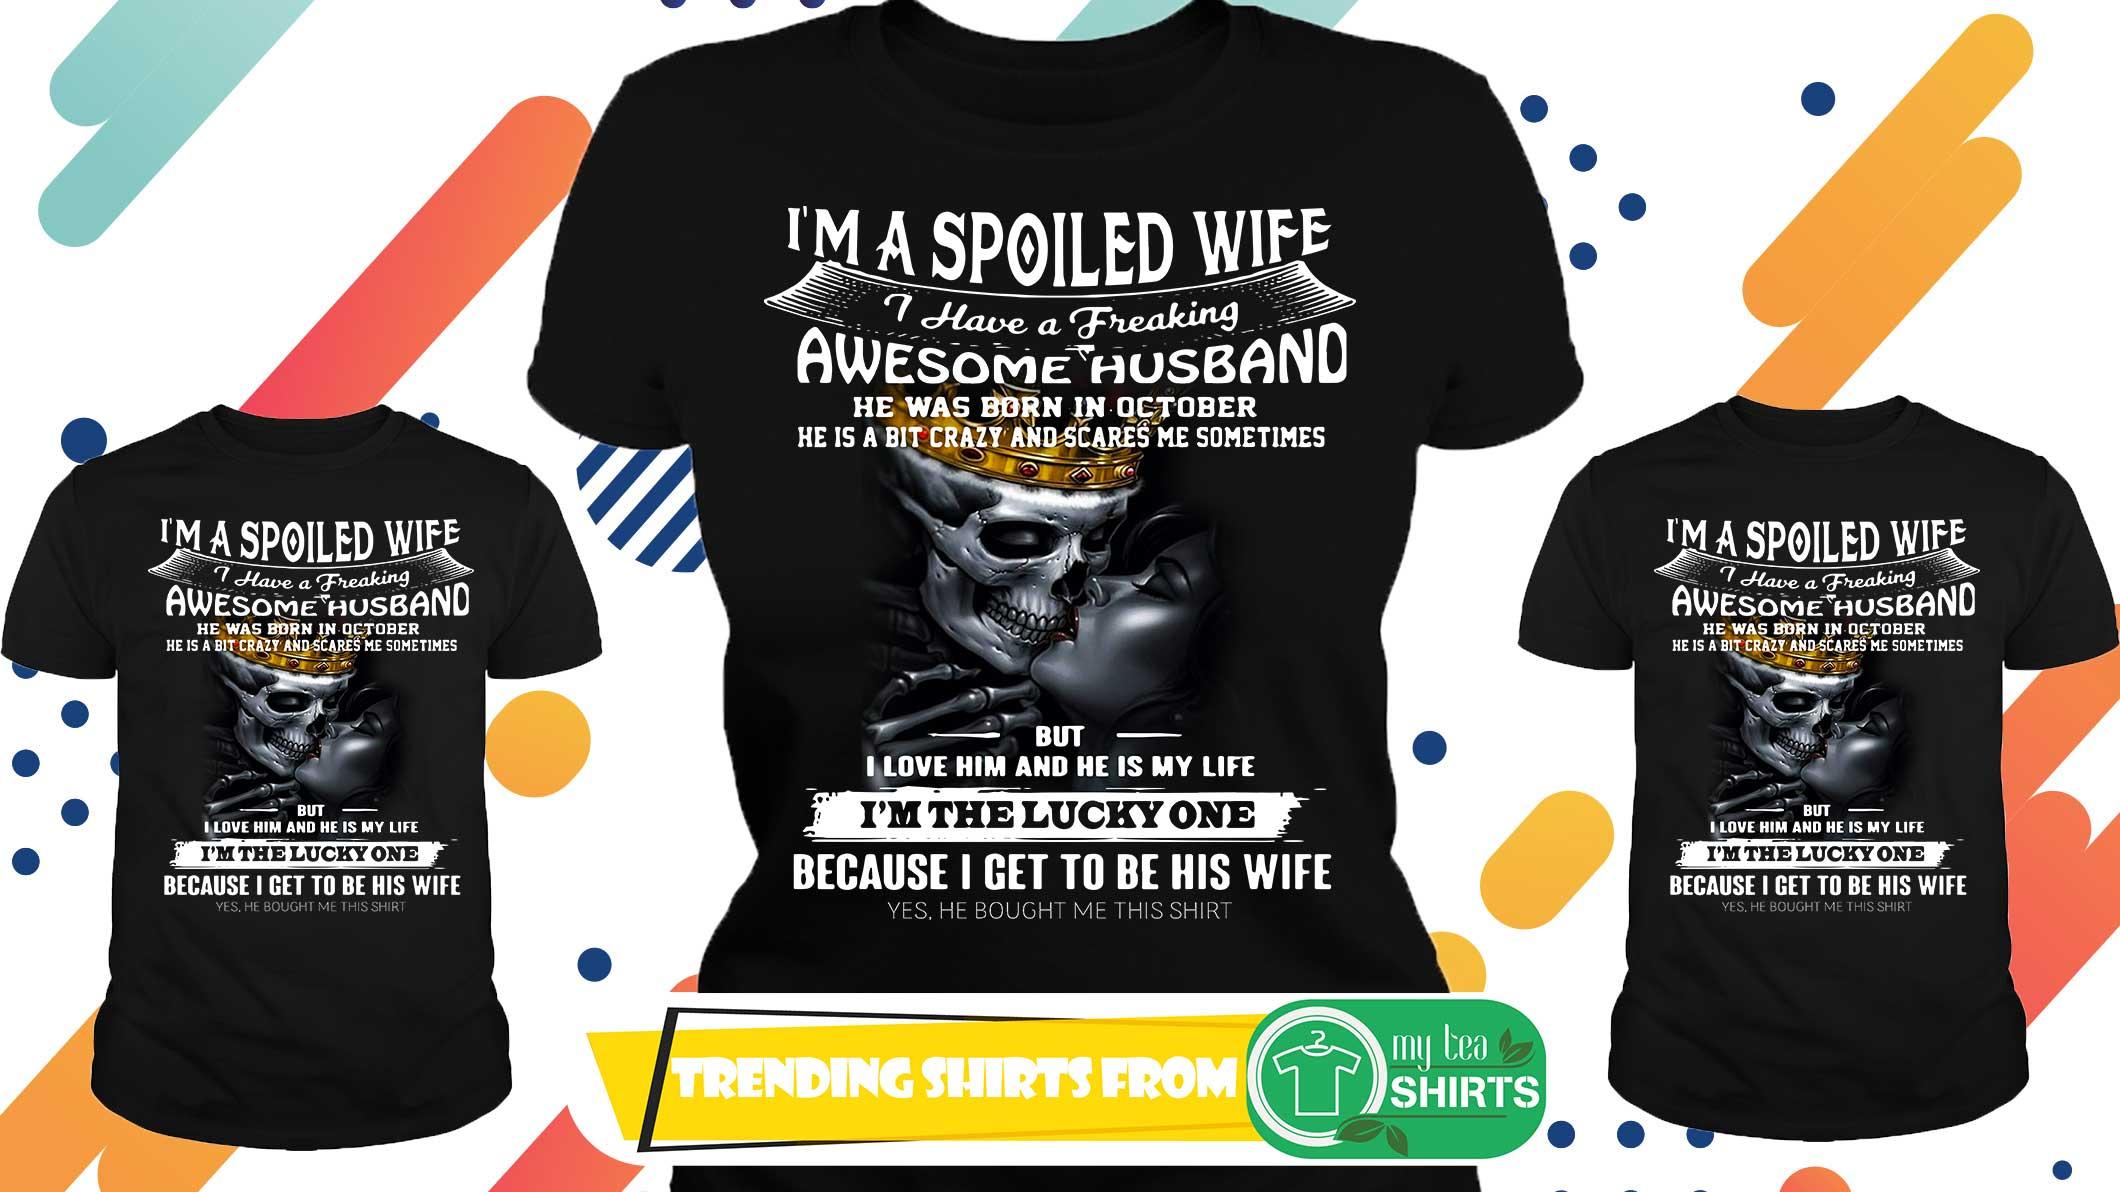 e49f055a I'm a spoiled wife I have a freaking awesome husband shirt, hoodie ...